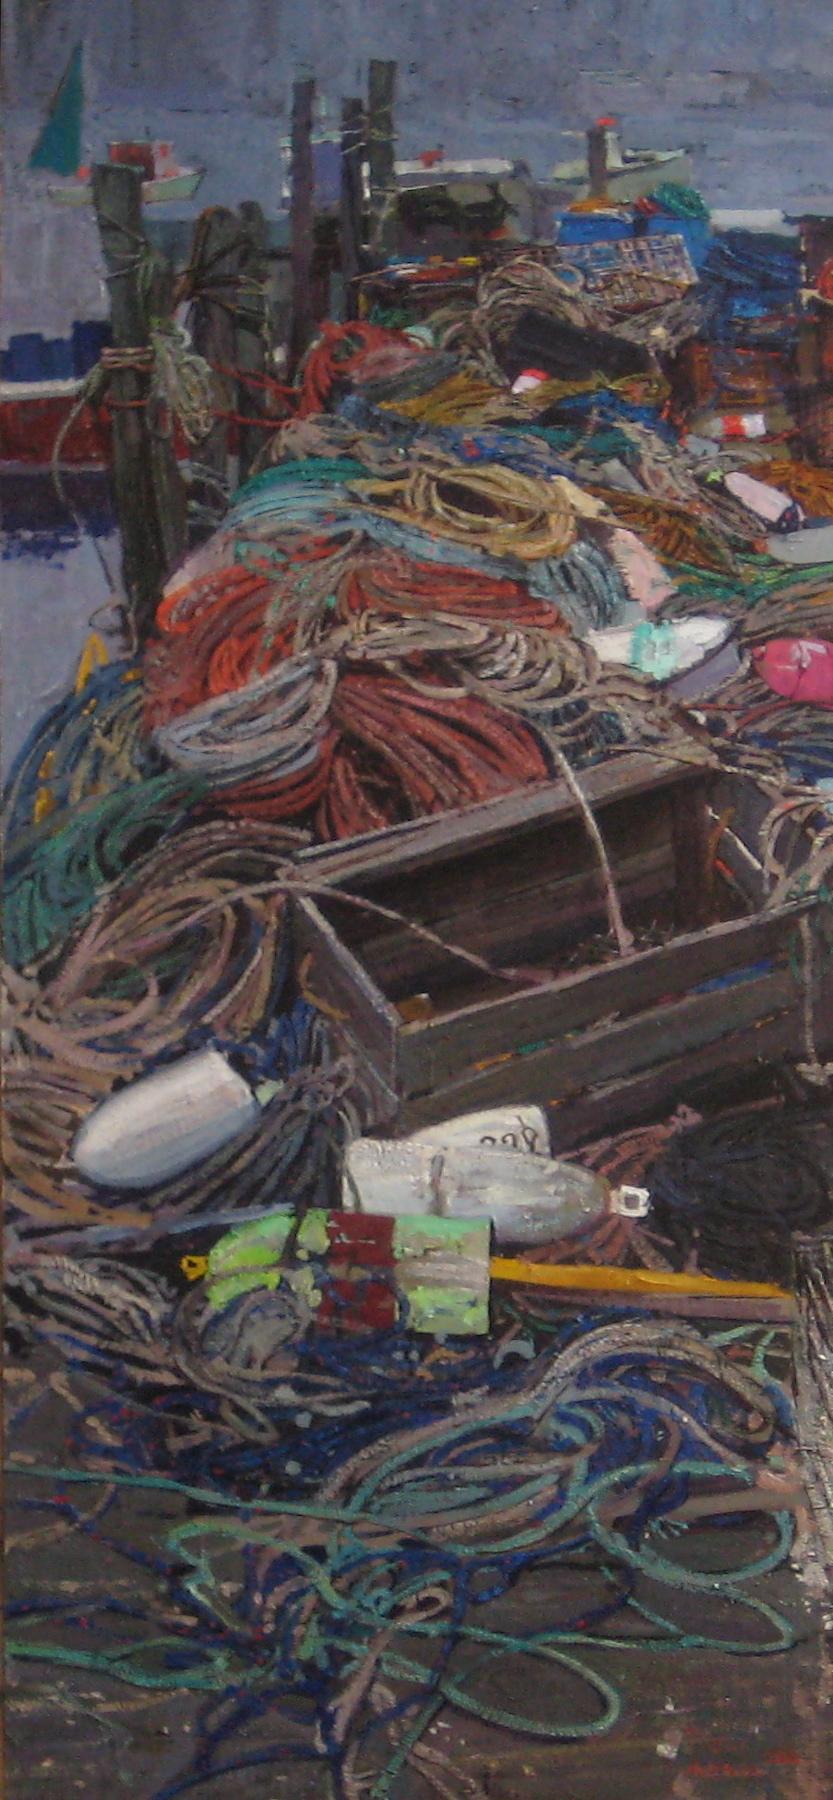 Timur Akhriev  Title: Tangled  6'' x 20'' Oil on Board, 2008. Sold.